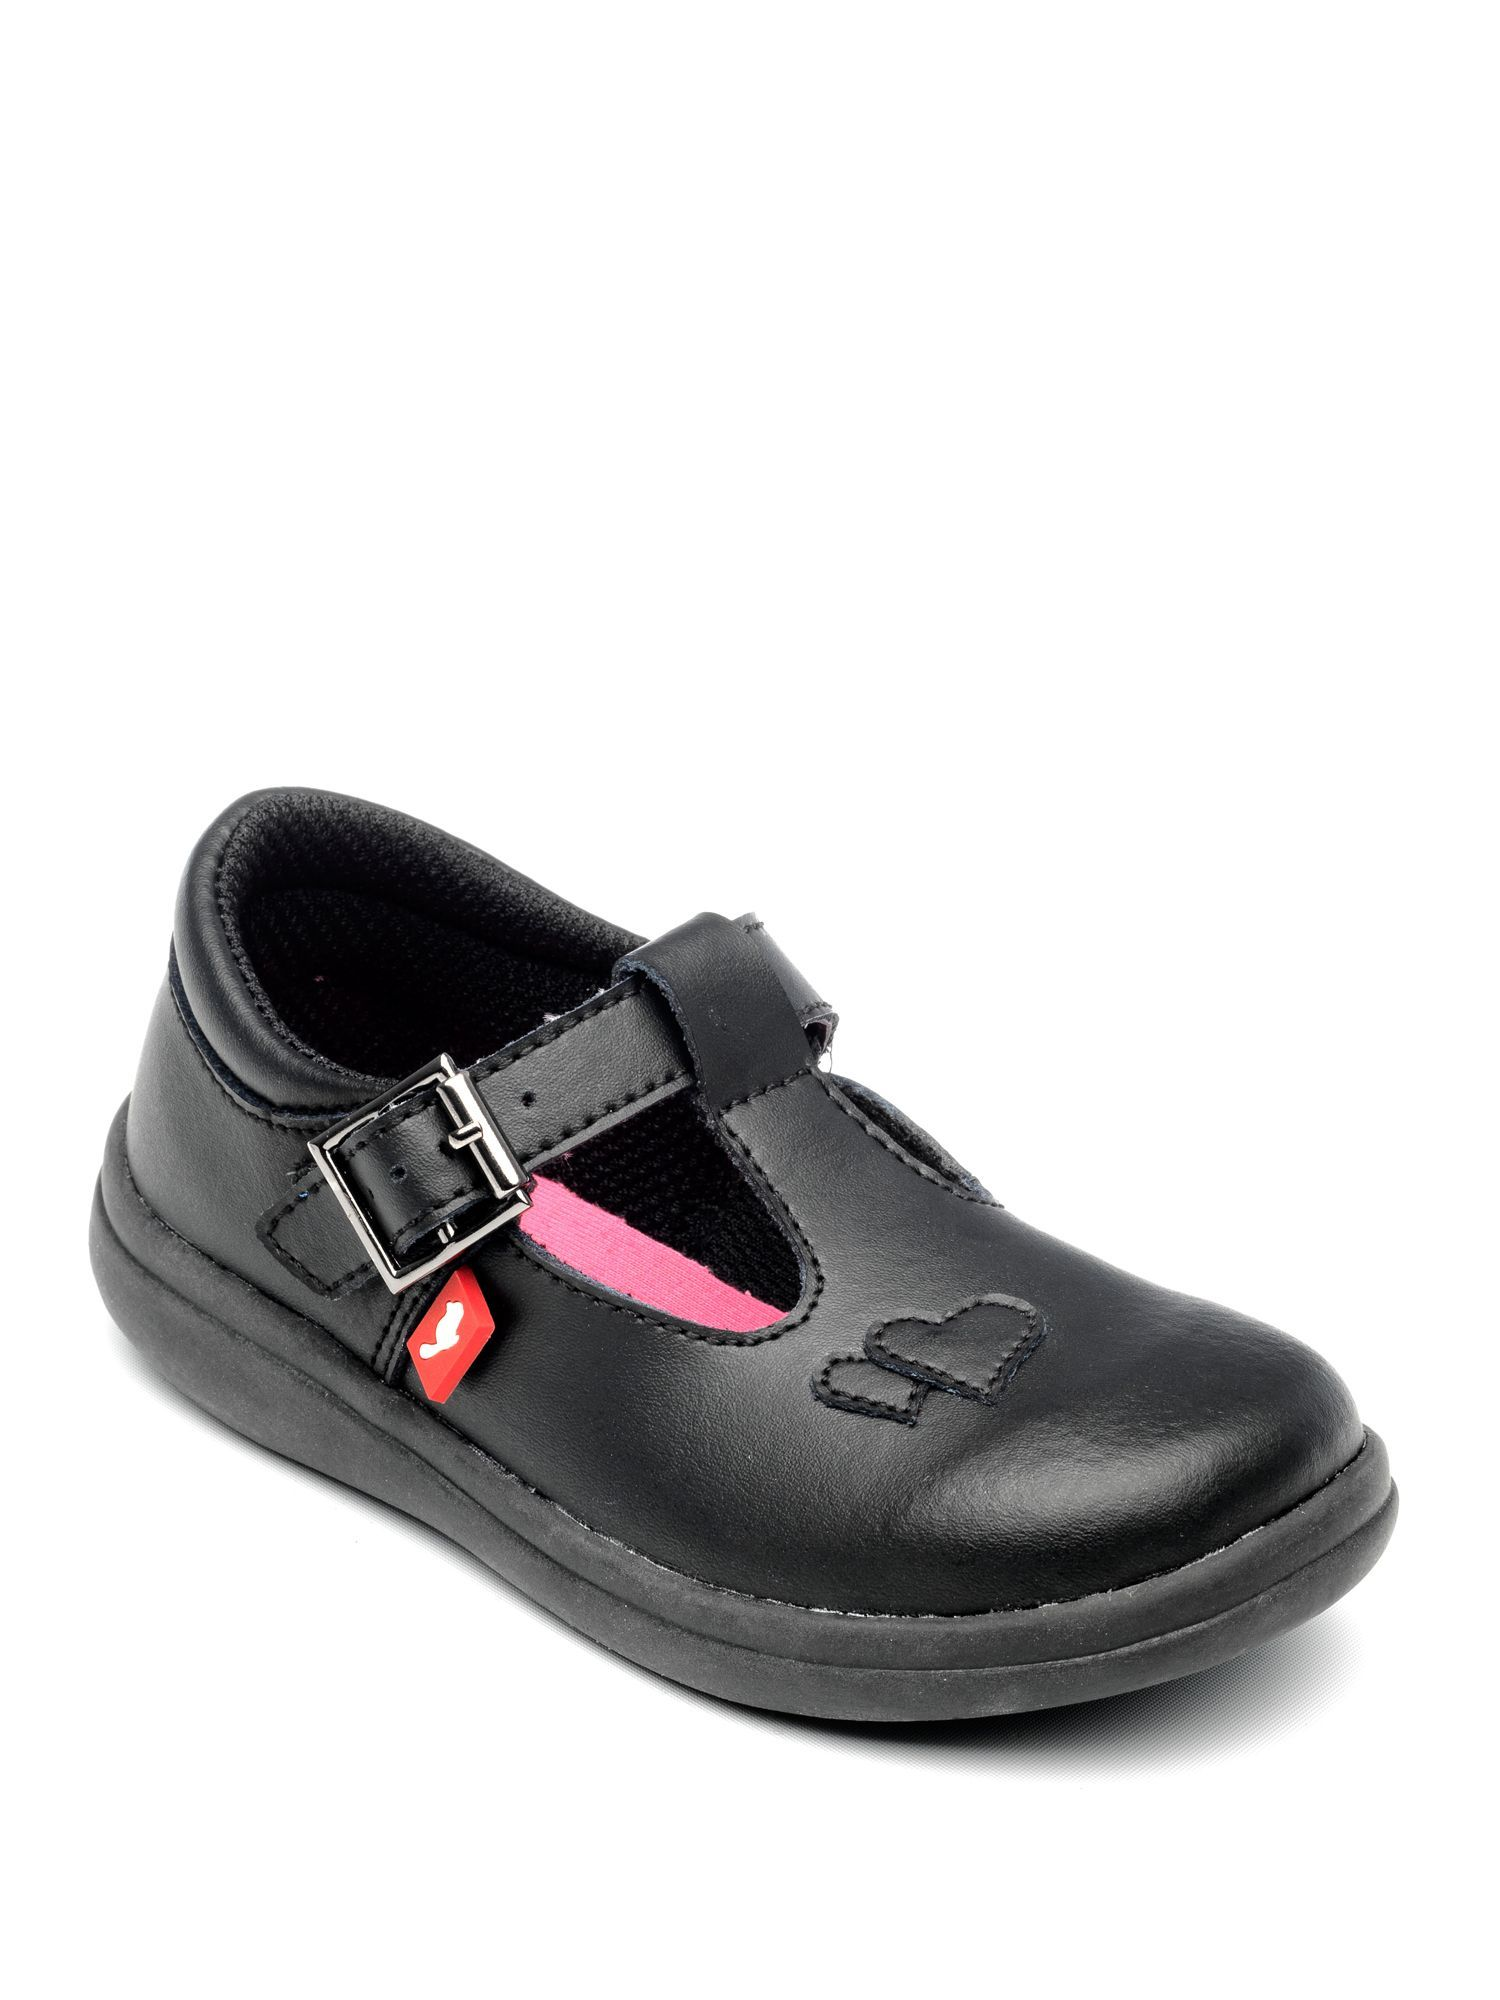 New Infants Chipmunks Black Trixie Leather Shoes Flats Buckle